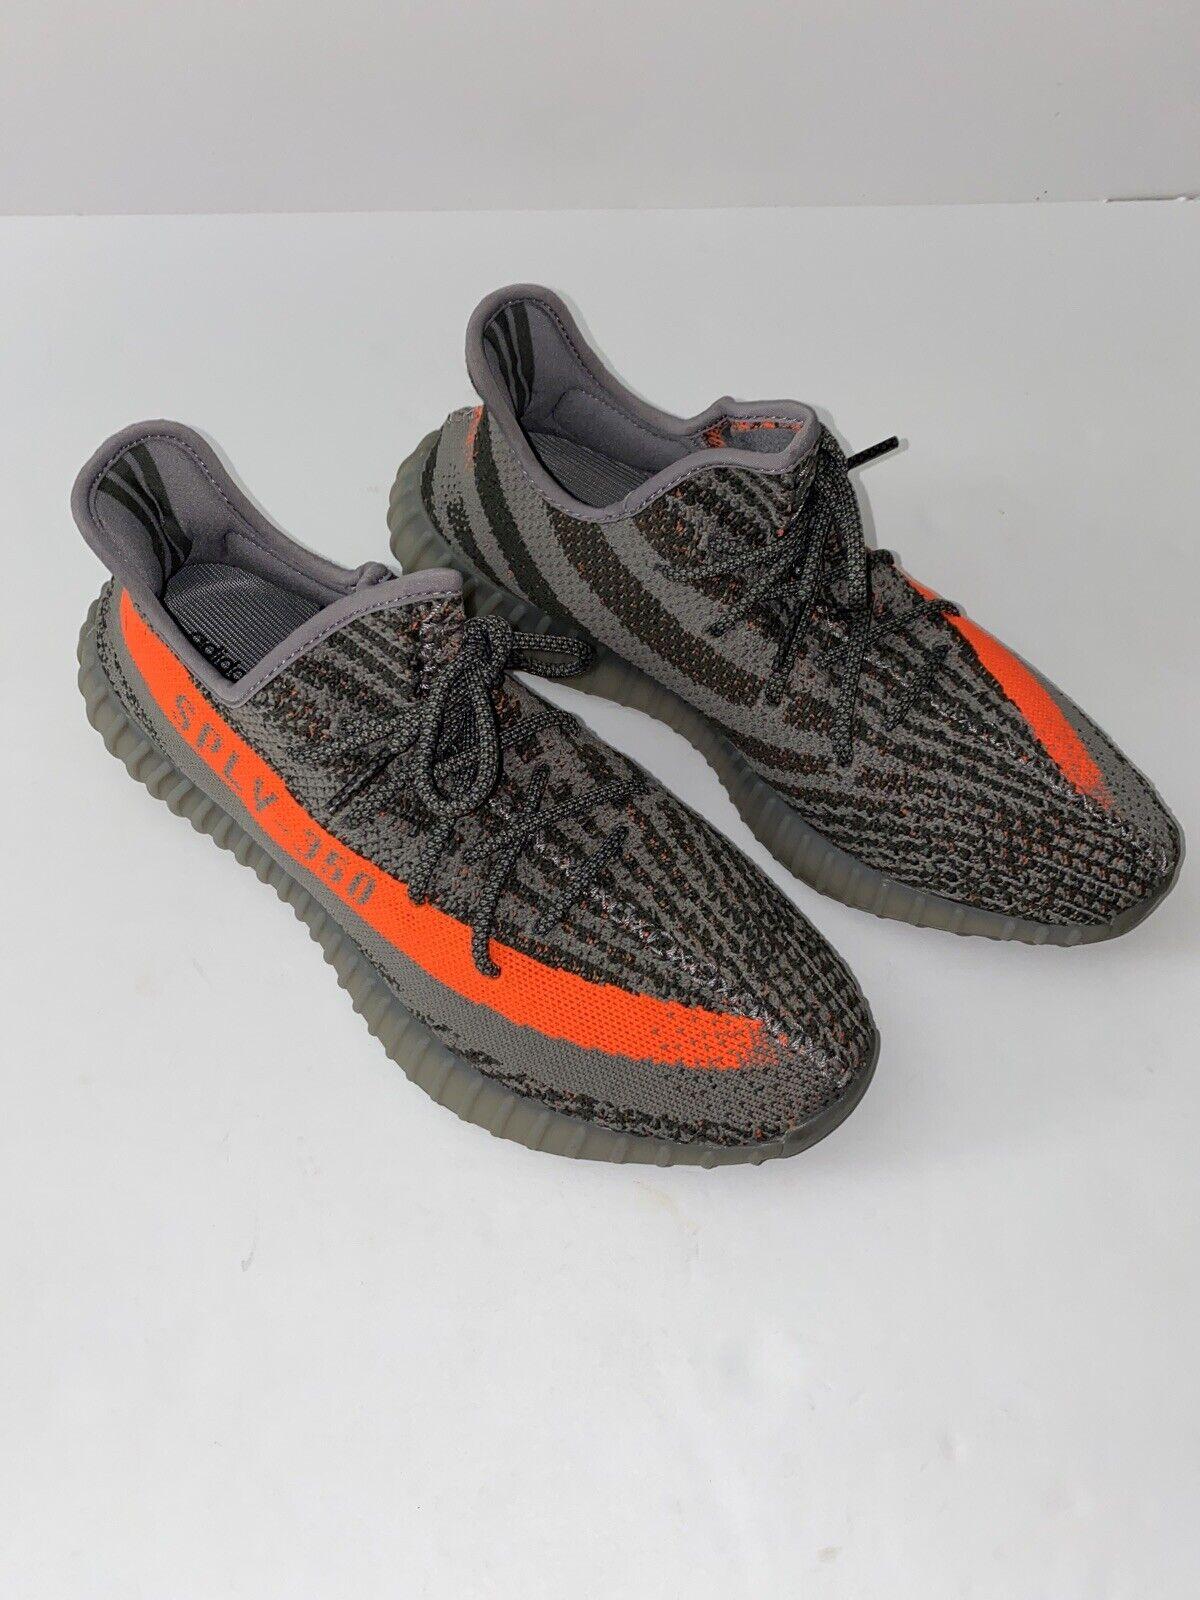 Adidas Yeezy Boost 350 V2 Beluga Men's